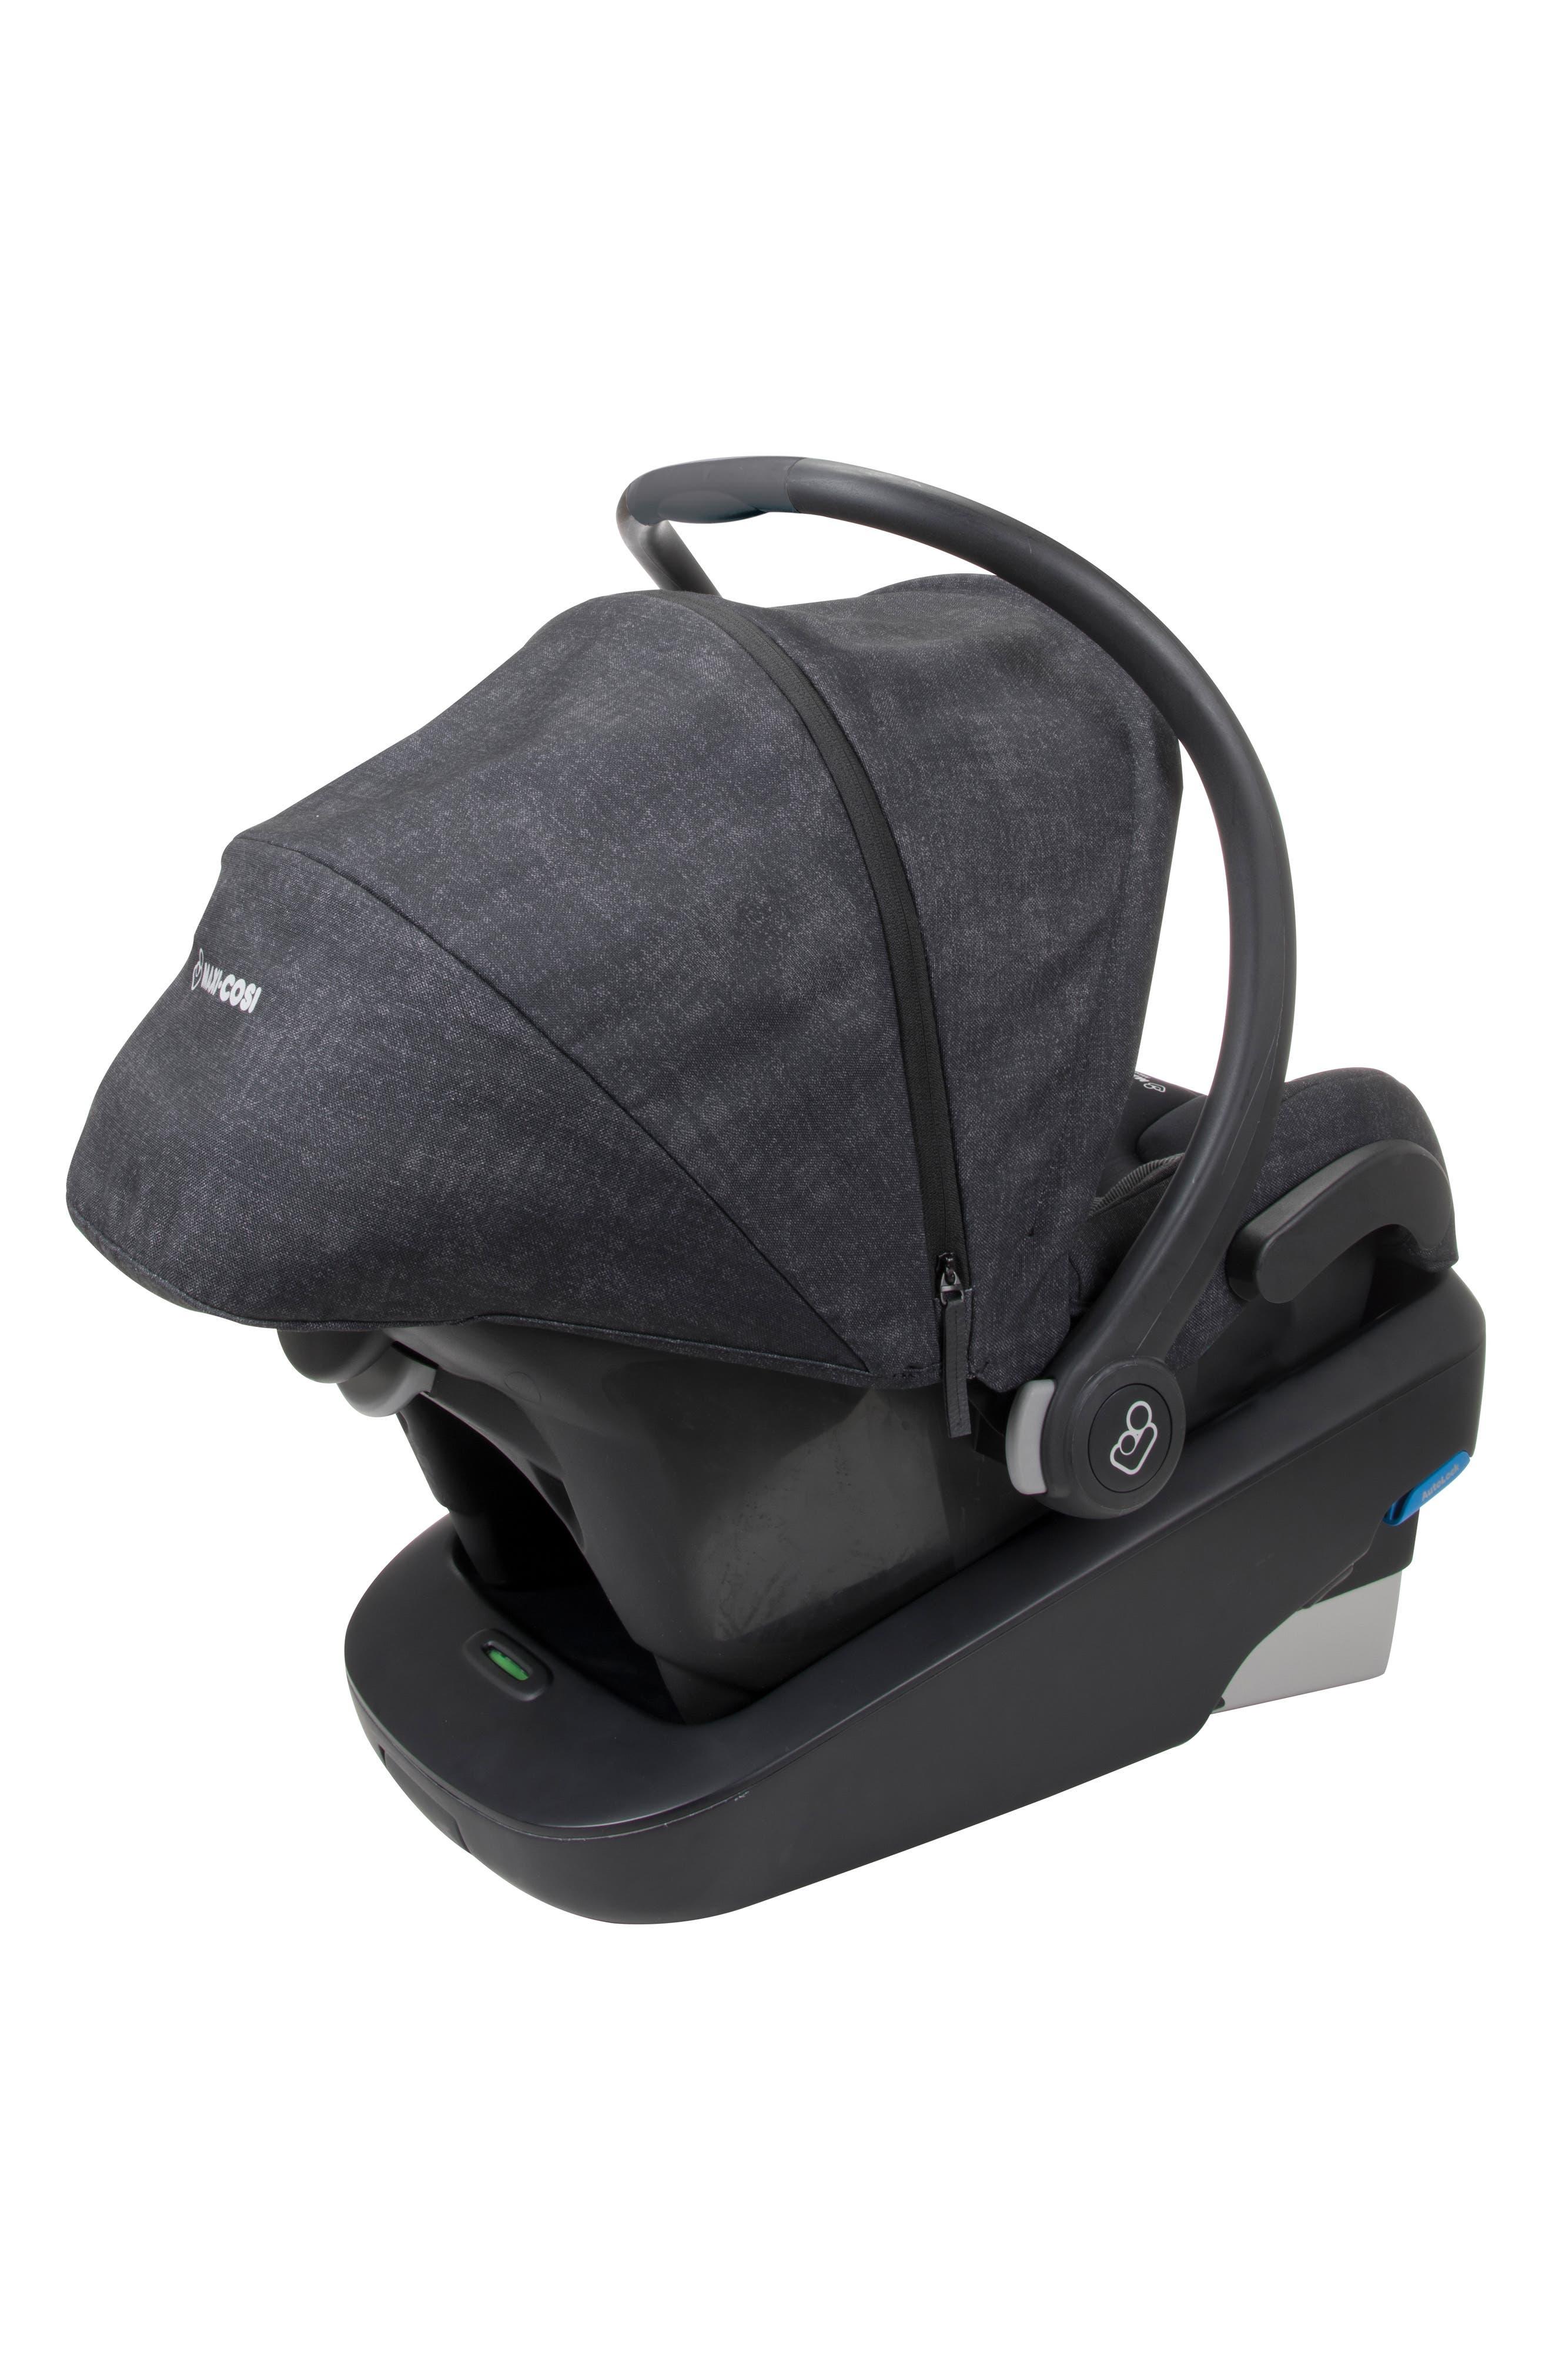 Mico Max Plus Infant Car Seat,                             Alternate thumbnail 8, color,                             NOMAD BLACK